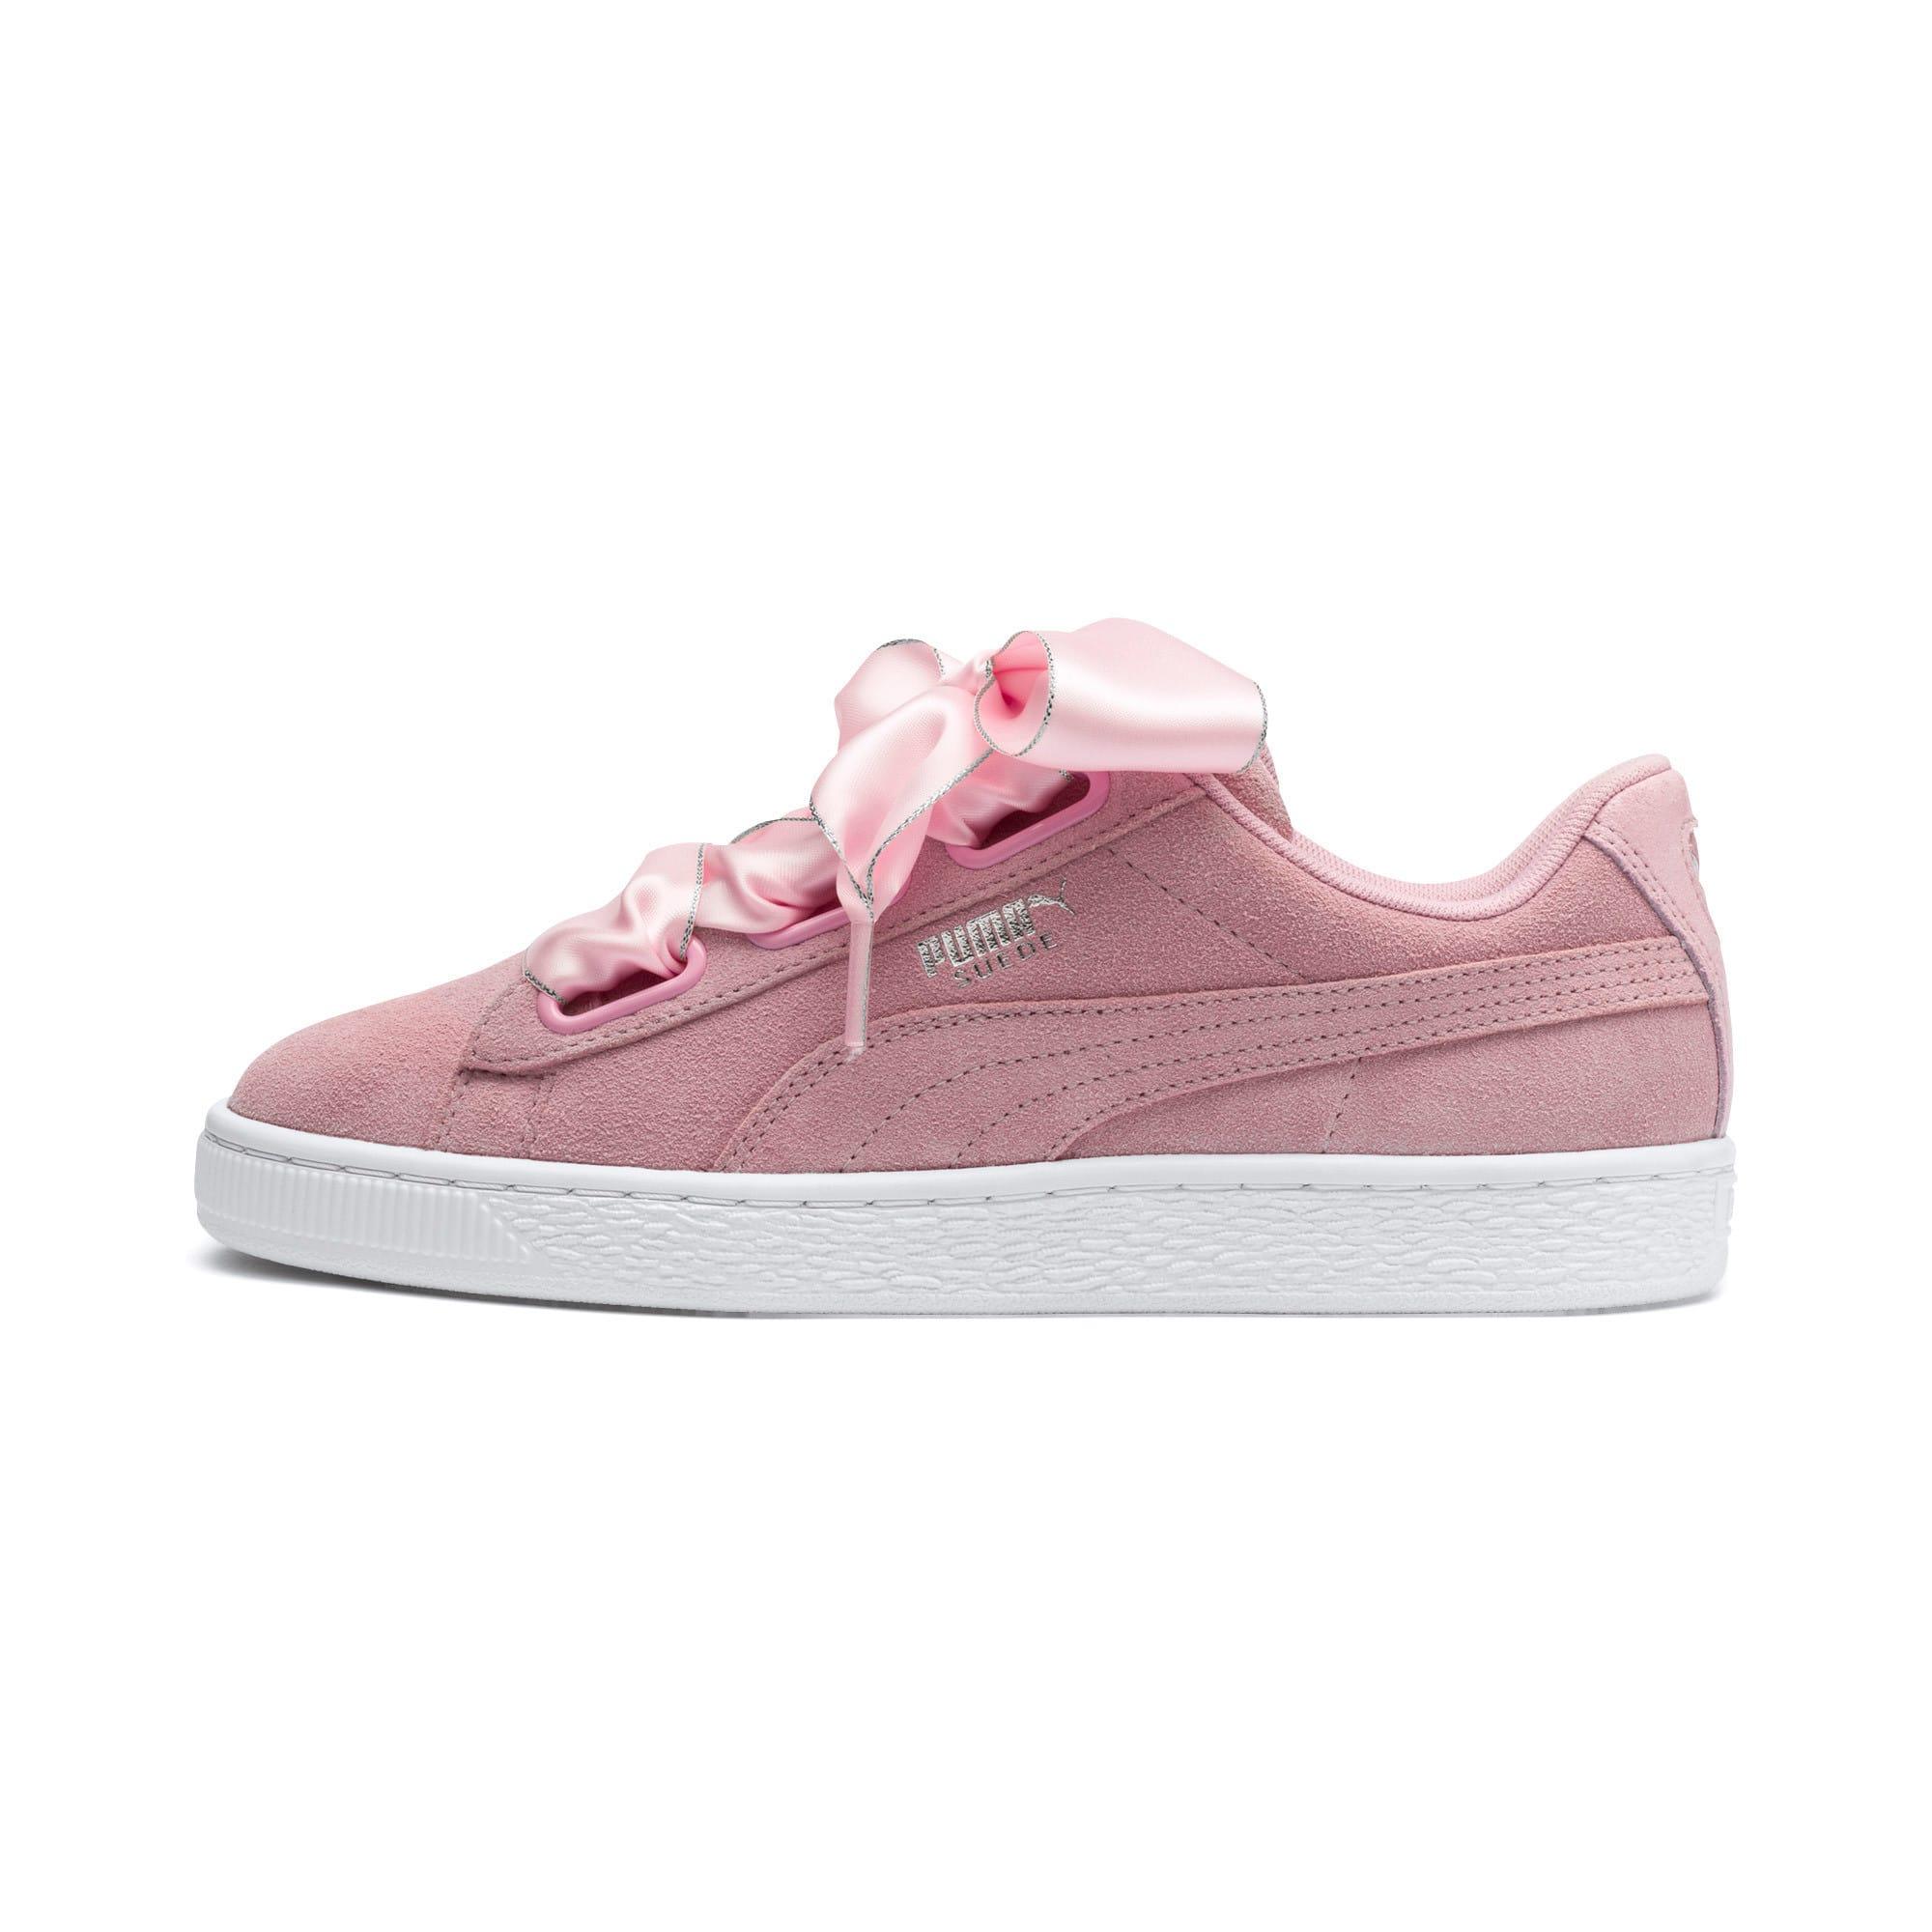 innovative design 5594a cc6a2 Suede Heart Galaxy Women's Sneakers